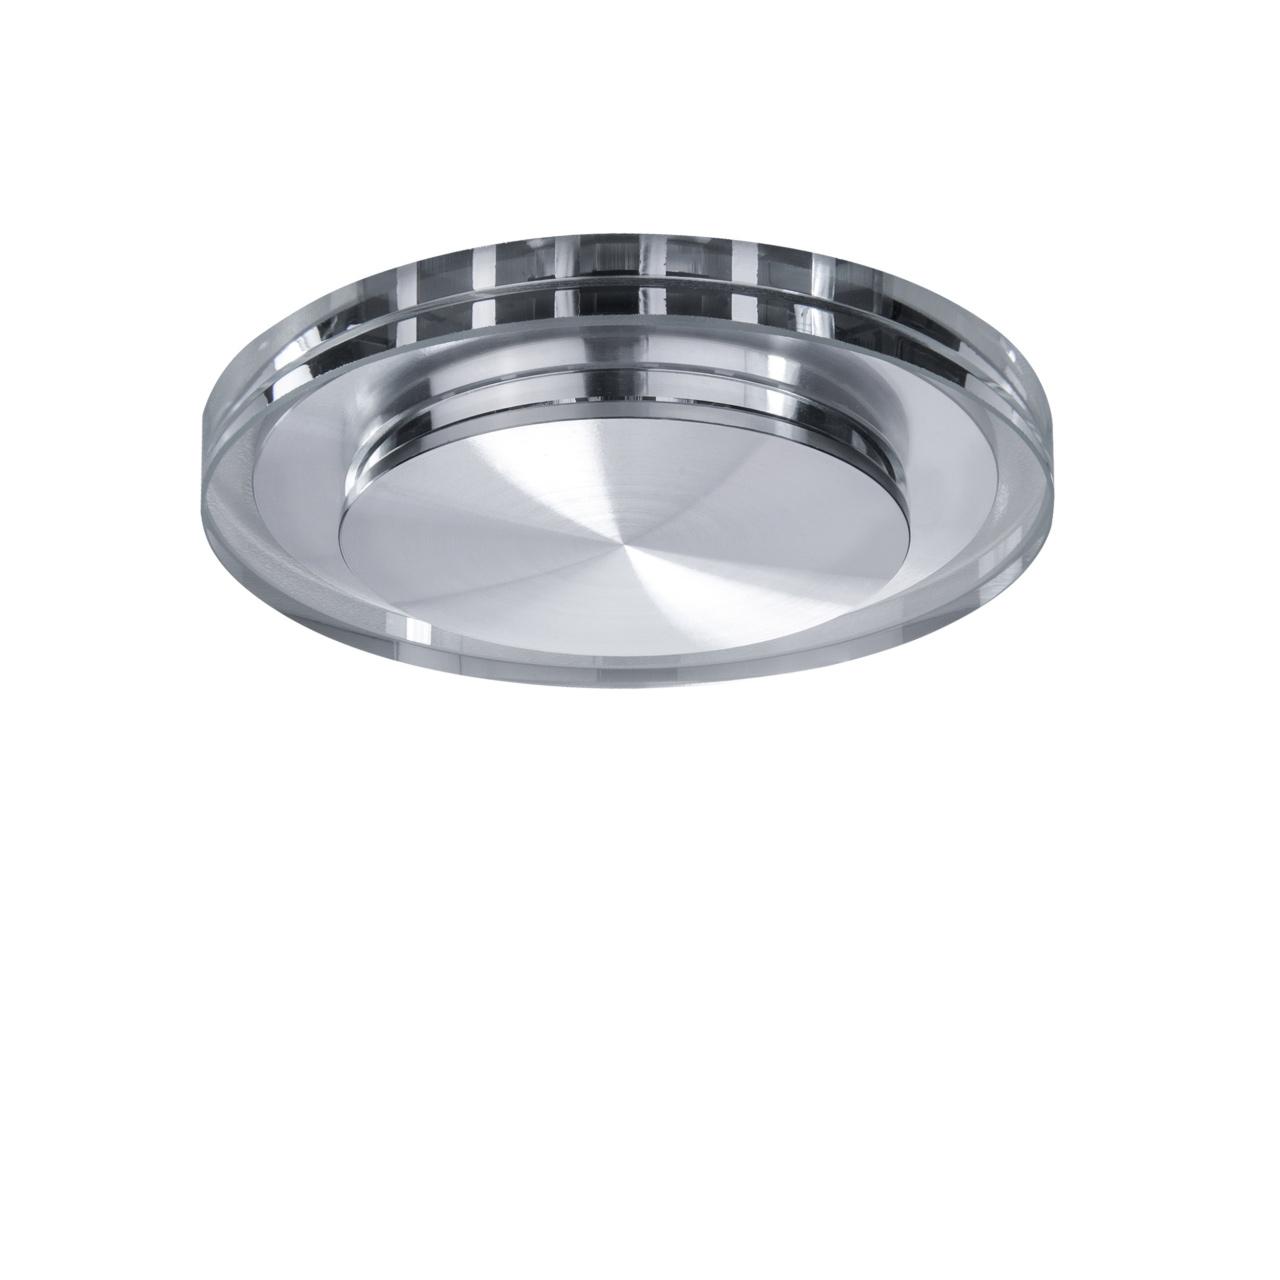 Светильник Speccio cyl LED 5W 380LM хром / прозрачный 3000K Lightstar 070312